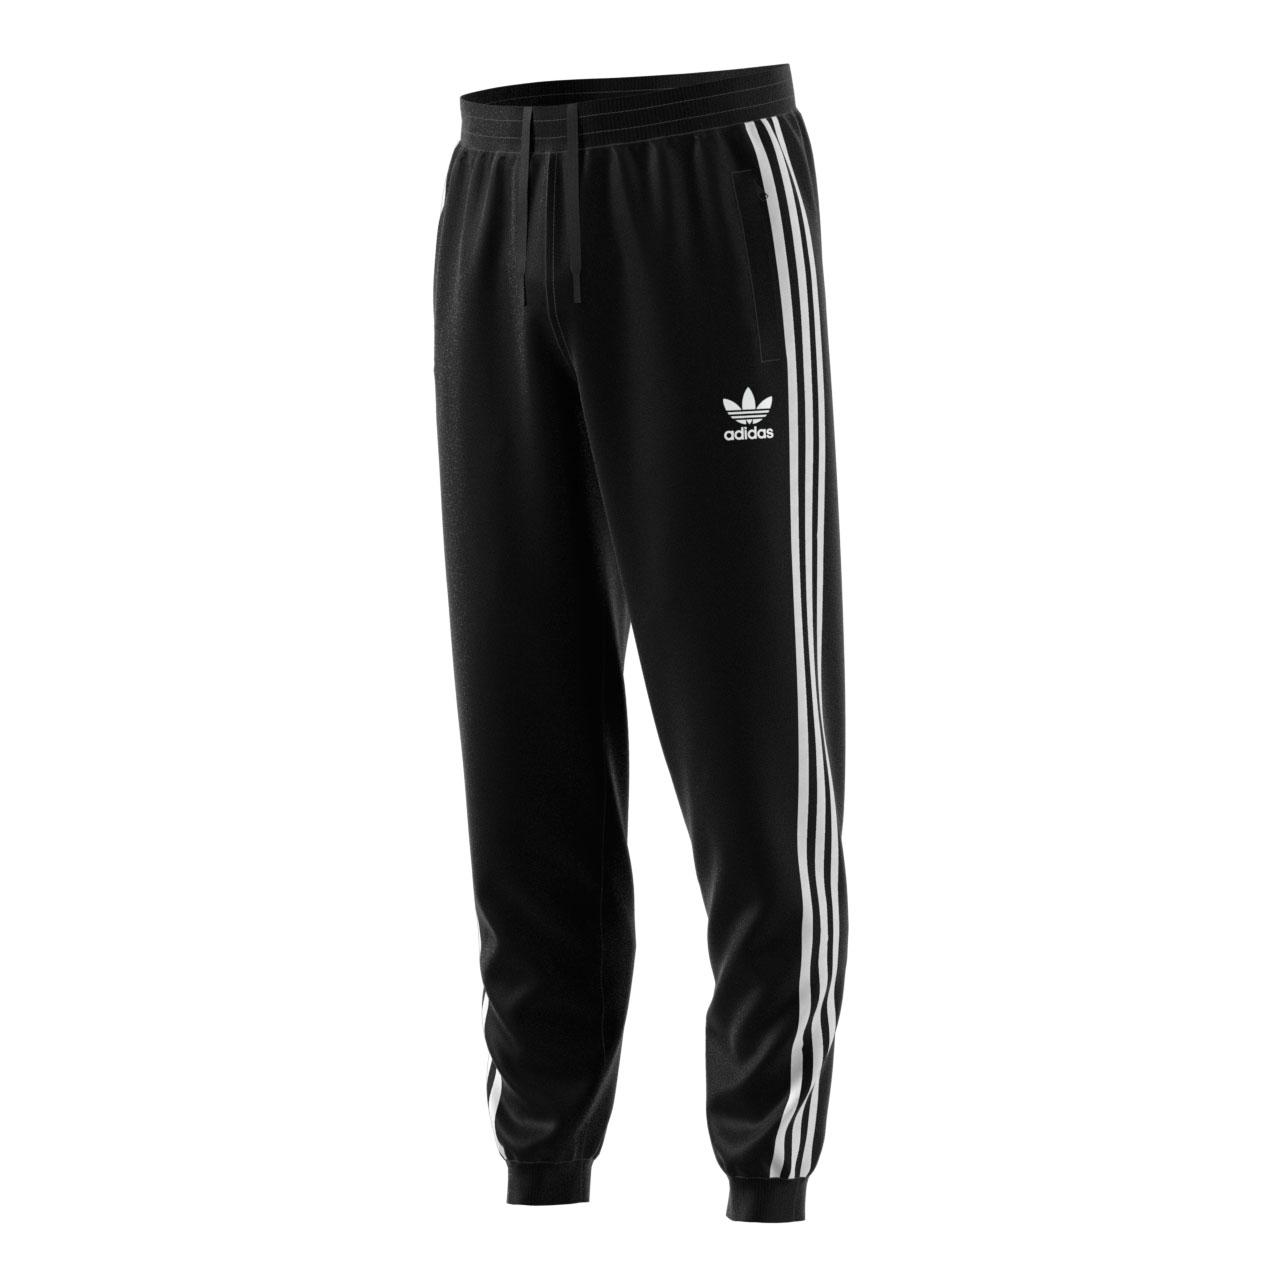 Details about Adidas Originals 3-Stripes Men's Athletic Casual Fashion  Joggers Black dh5801